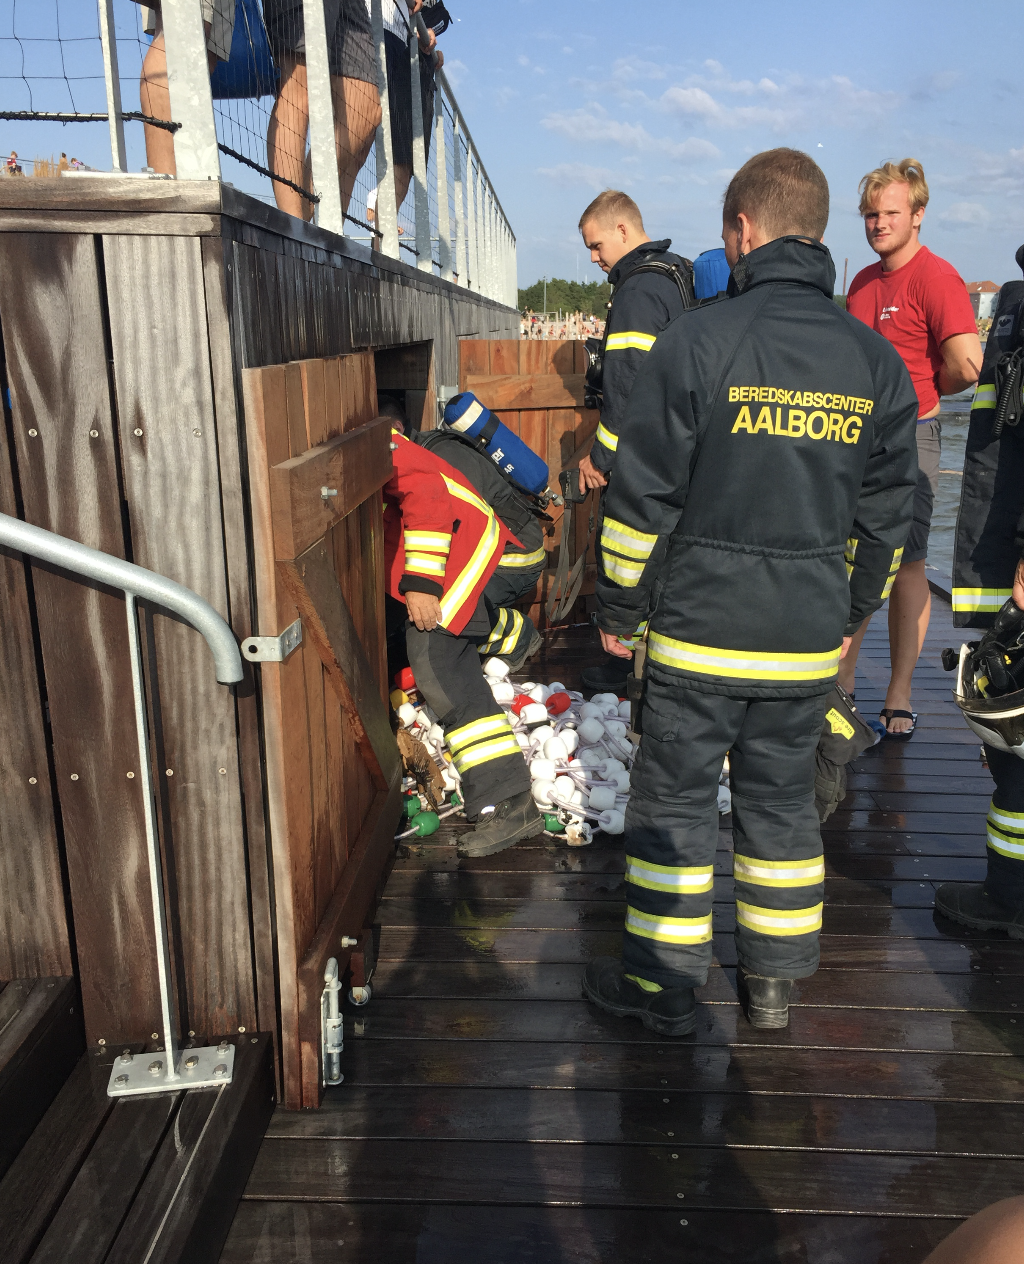 Brand i Vestre Fjordpark: Politi og brandbiler blev tilkaldt